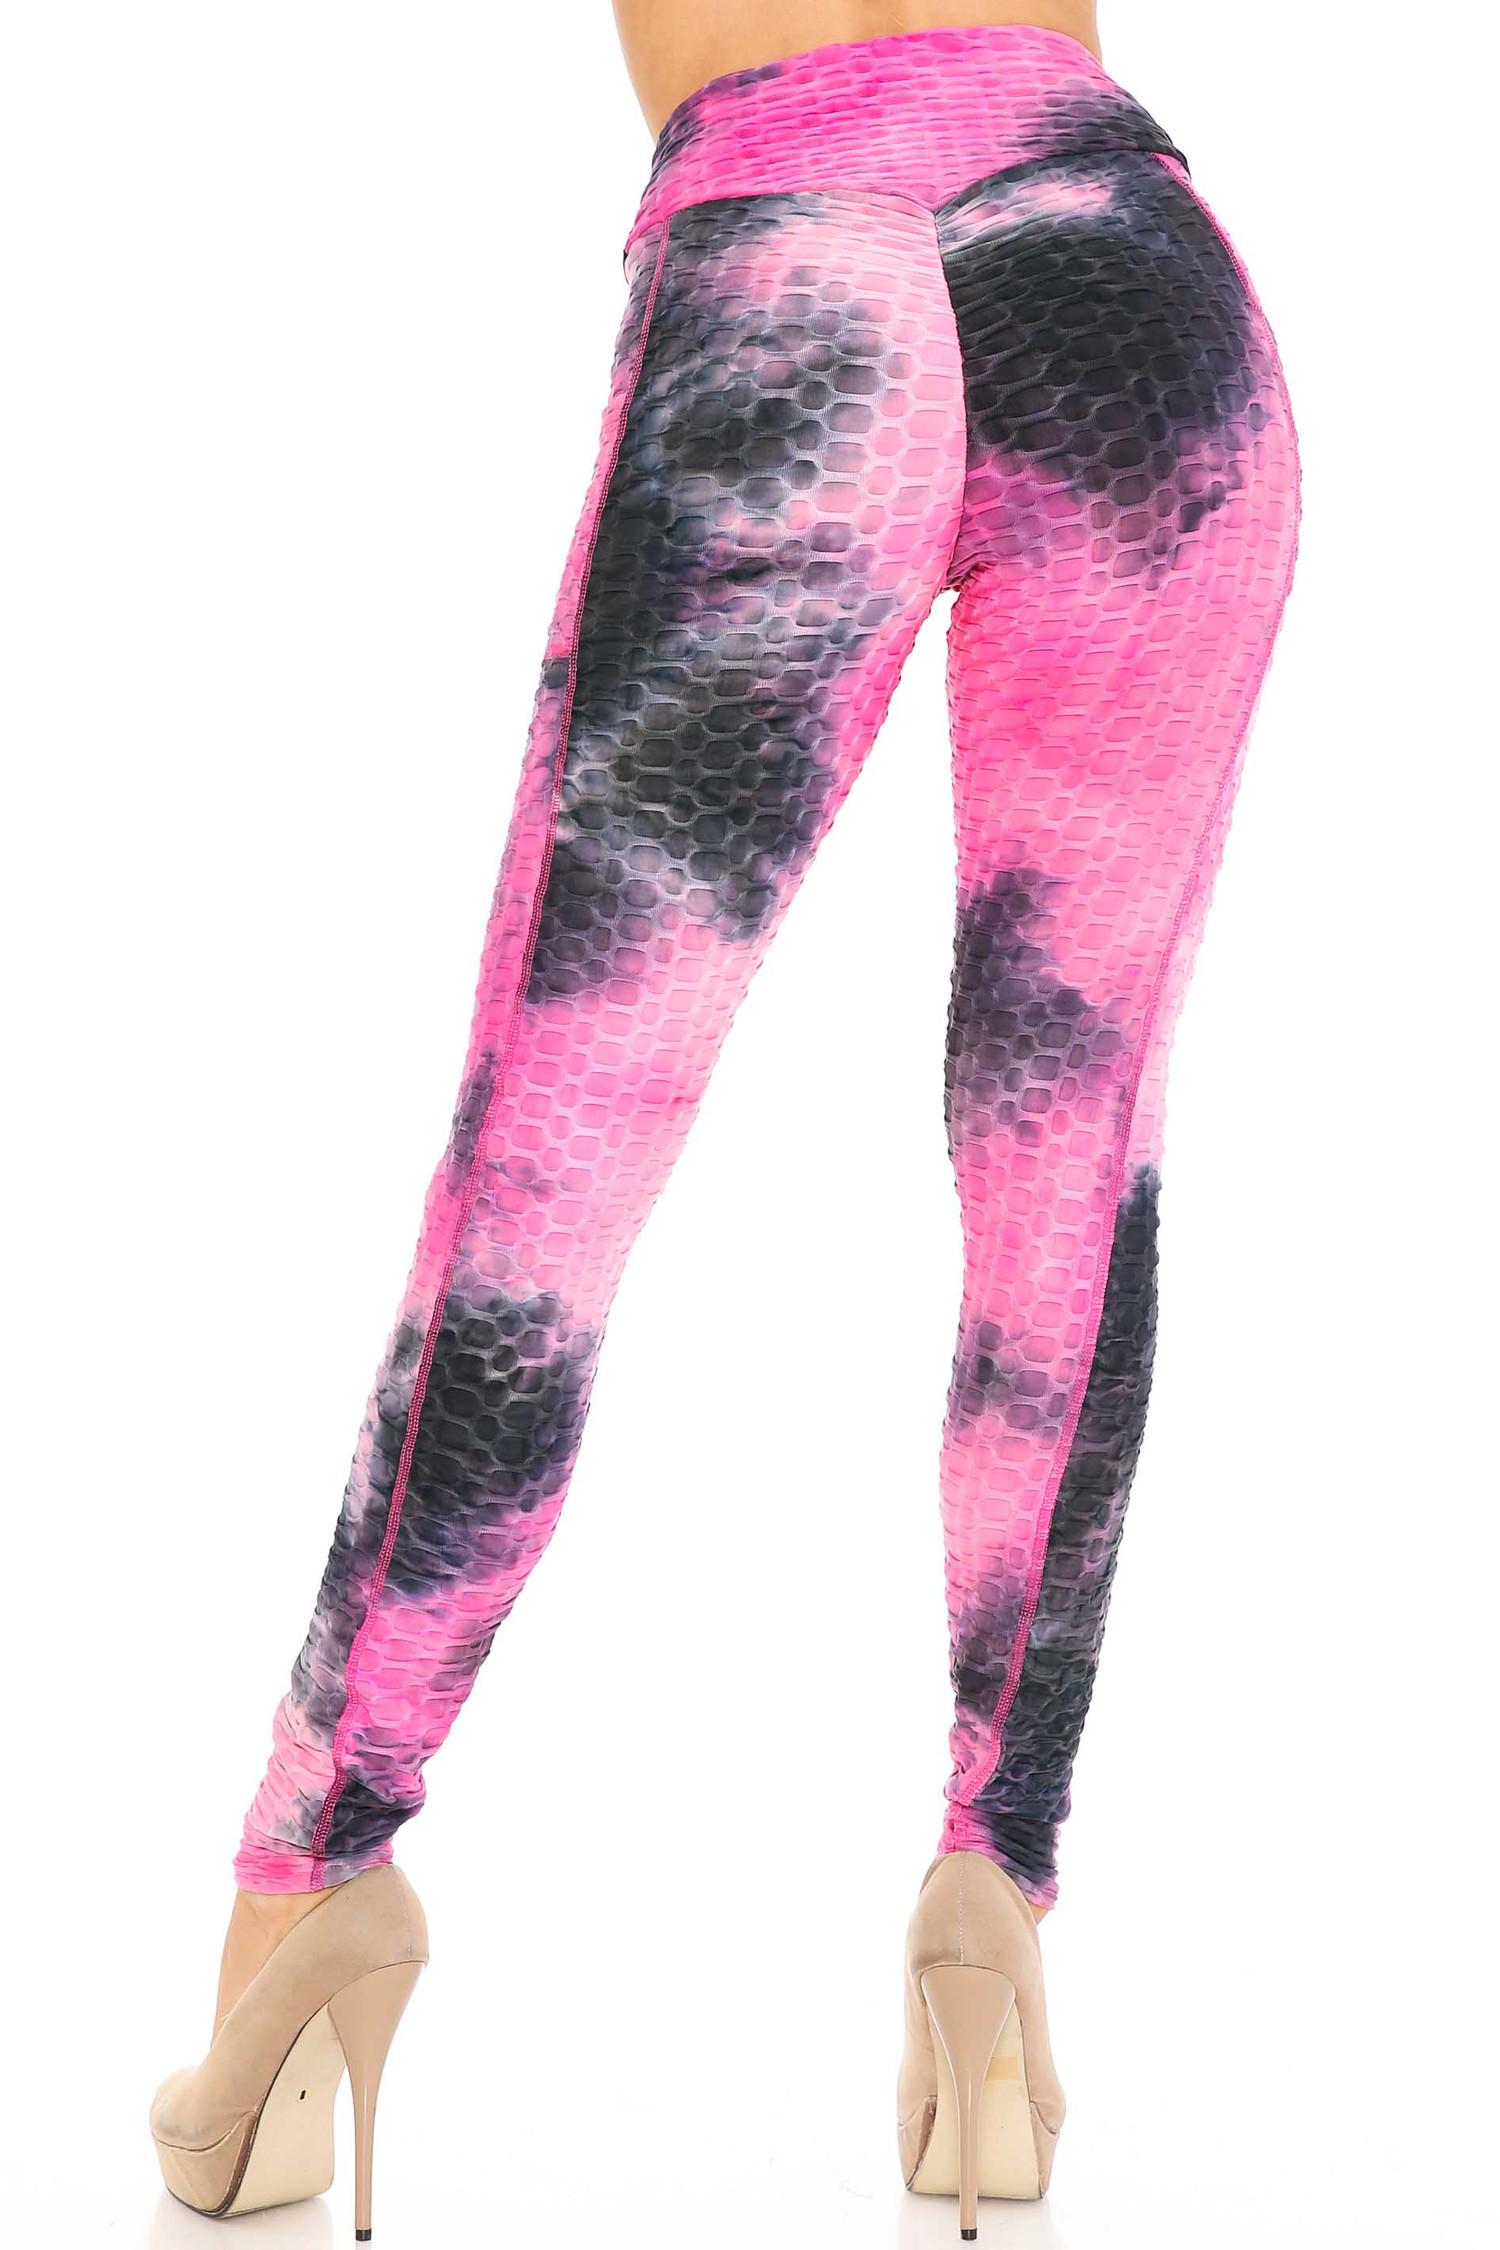 Premium Fuchsia Tie Dye Scrunch Butt Workout Leggings with Side Pockets